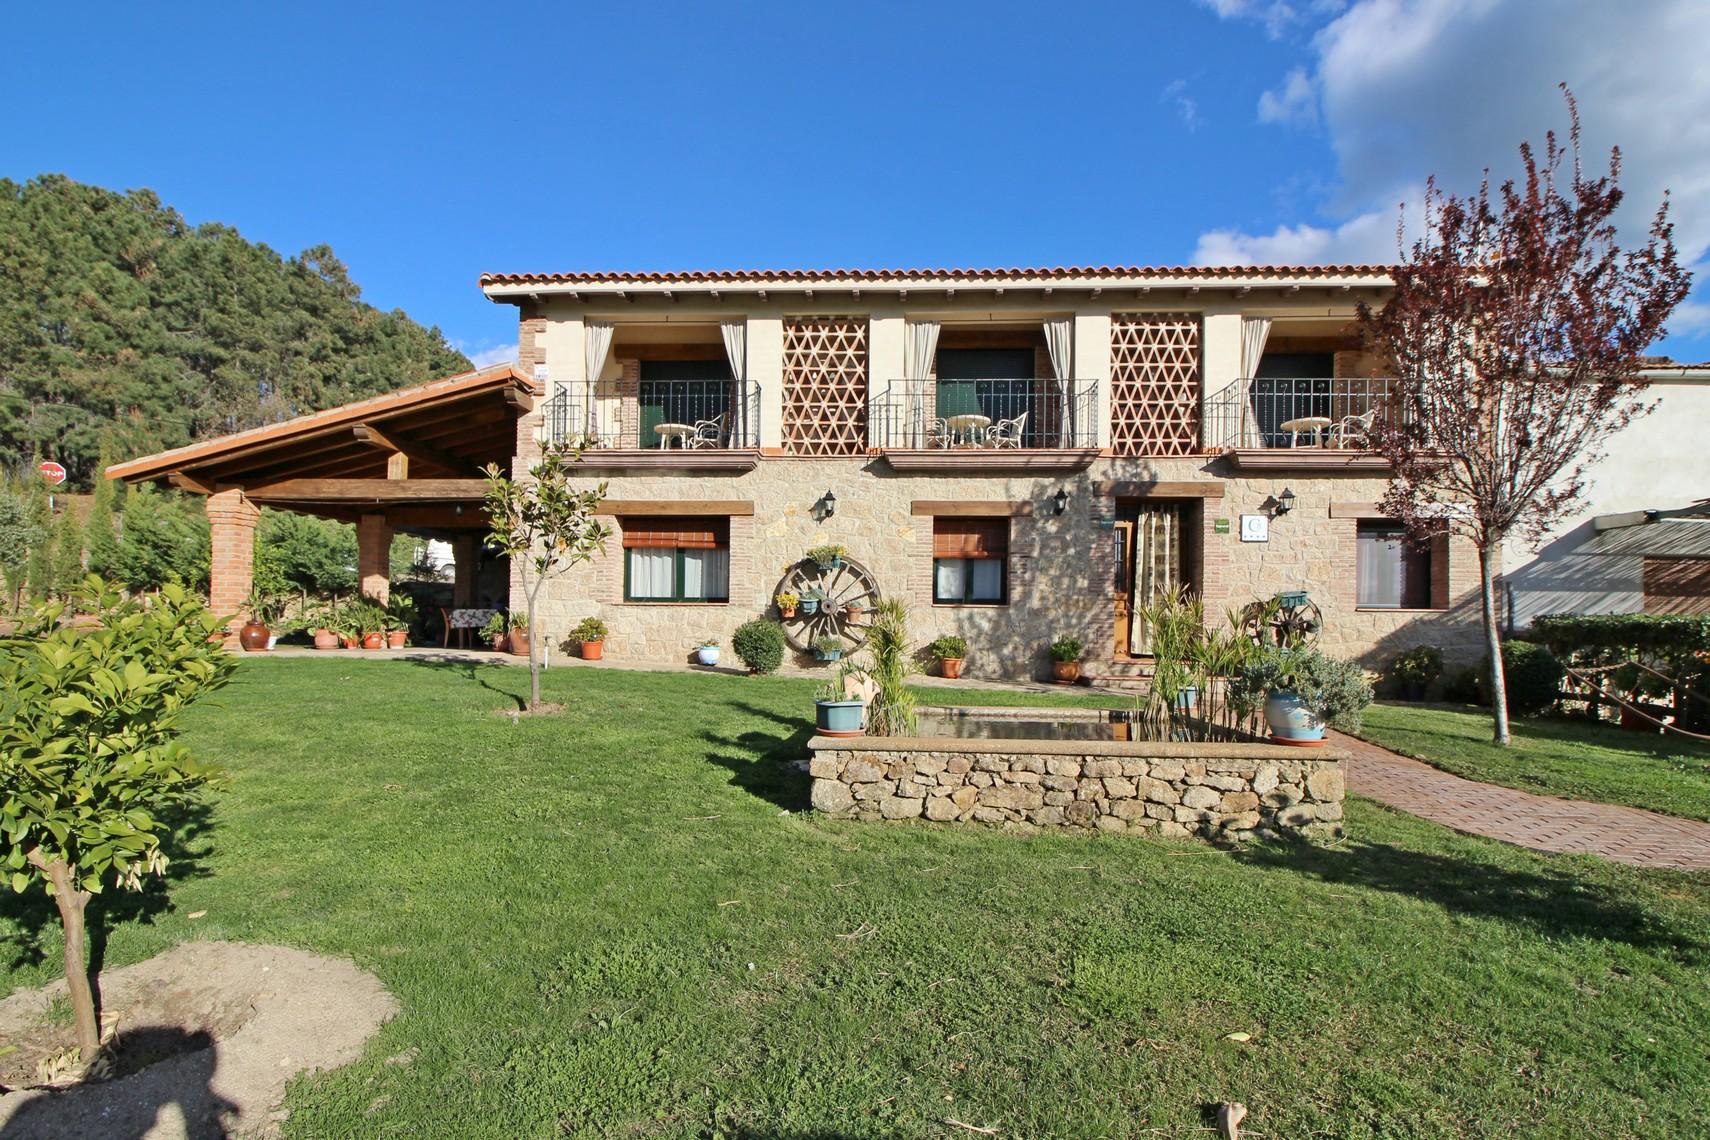 Casa_rural_Jarandilla_vera00002